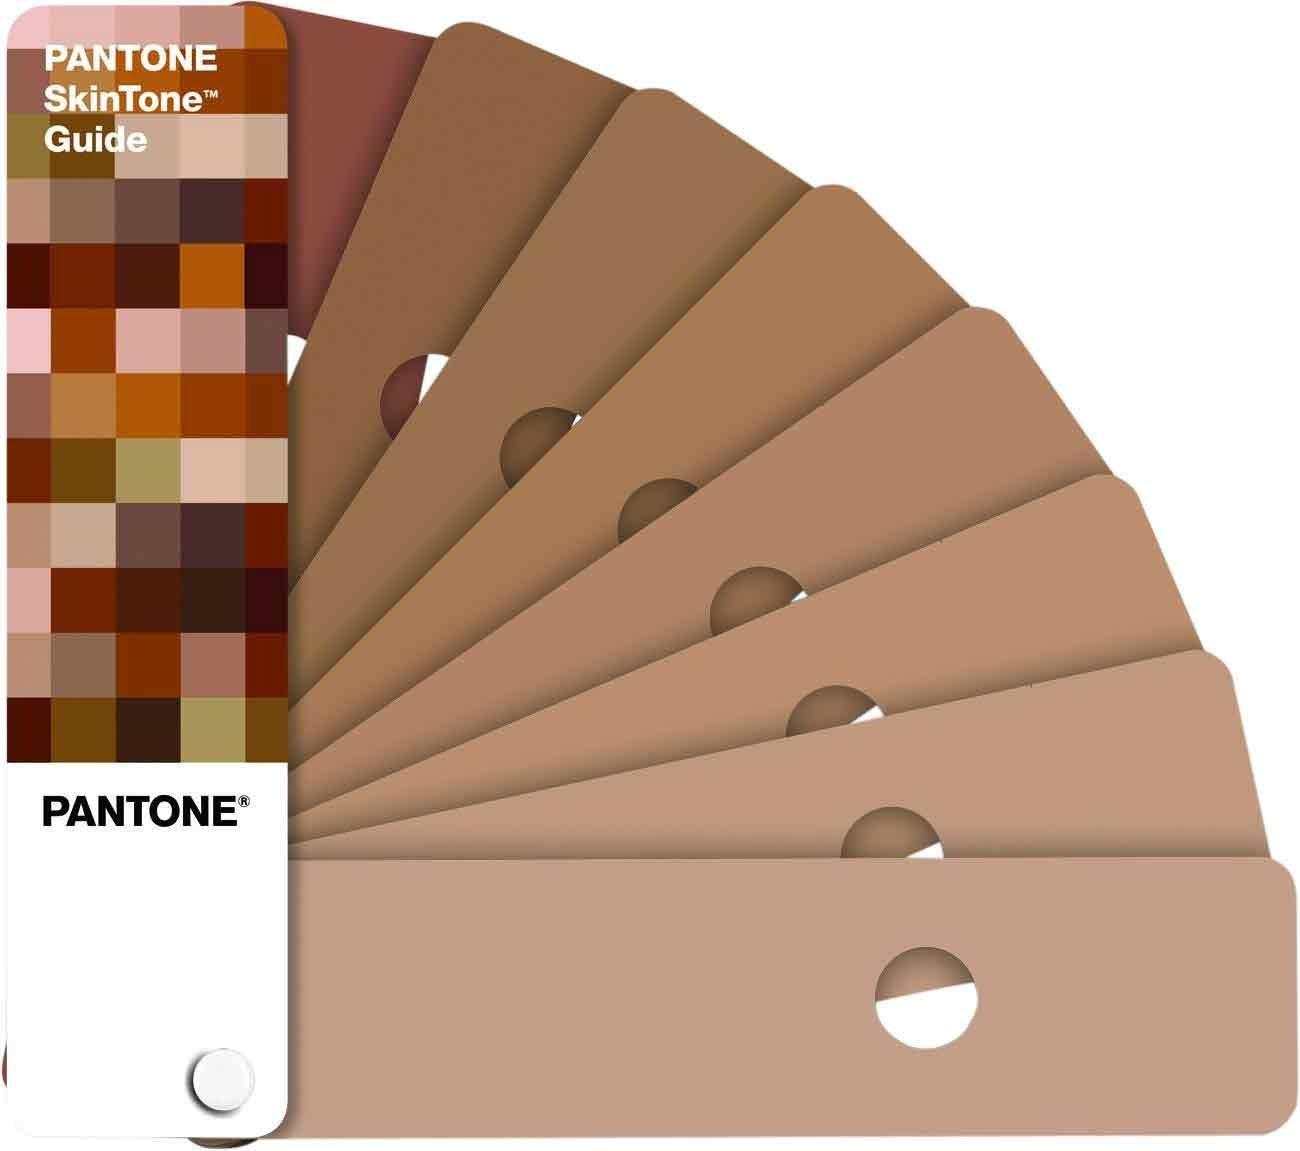 【永昌文具】PANTONE - Skin Tone Guide 膚色指南色卡 STG201 /本